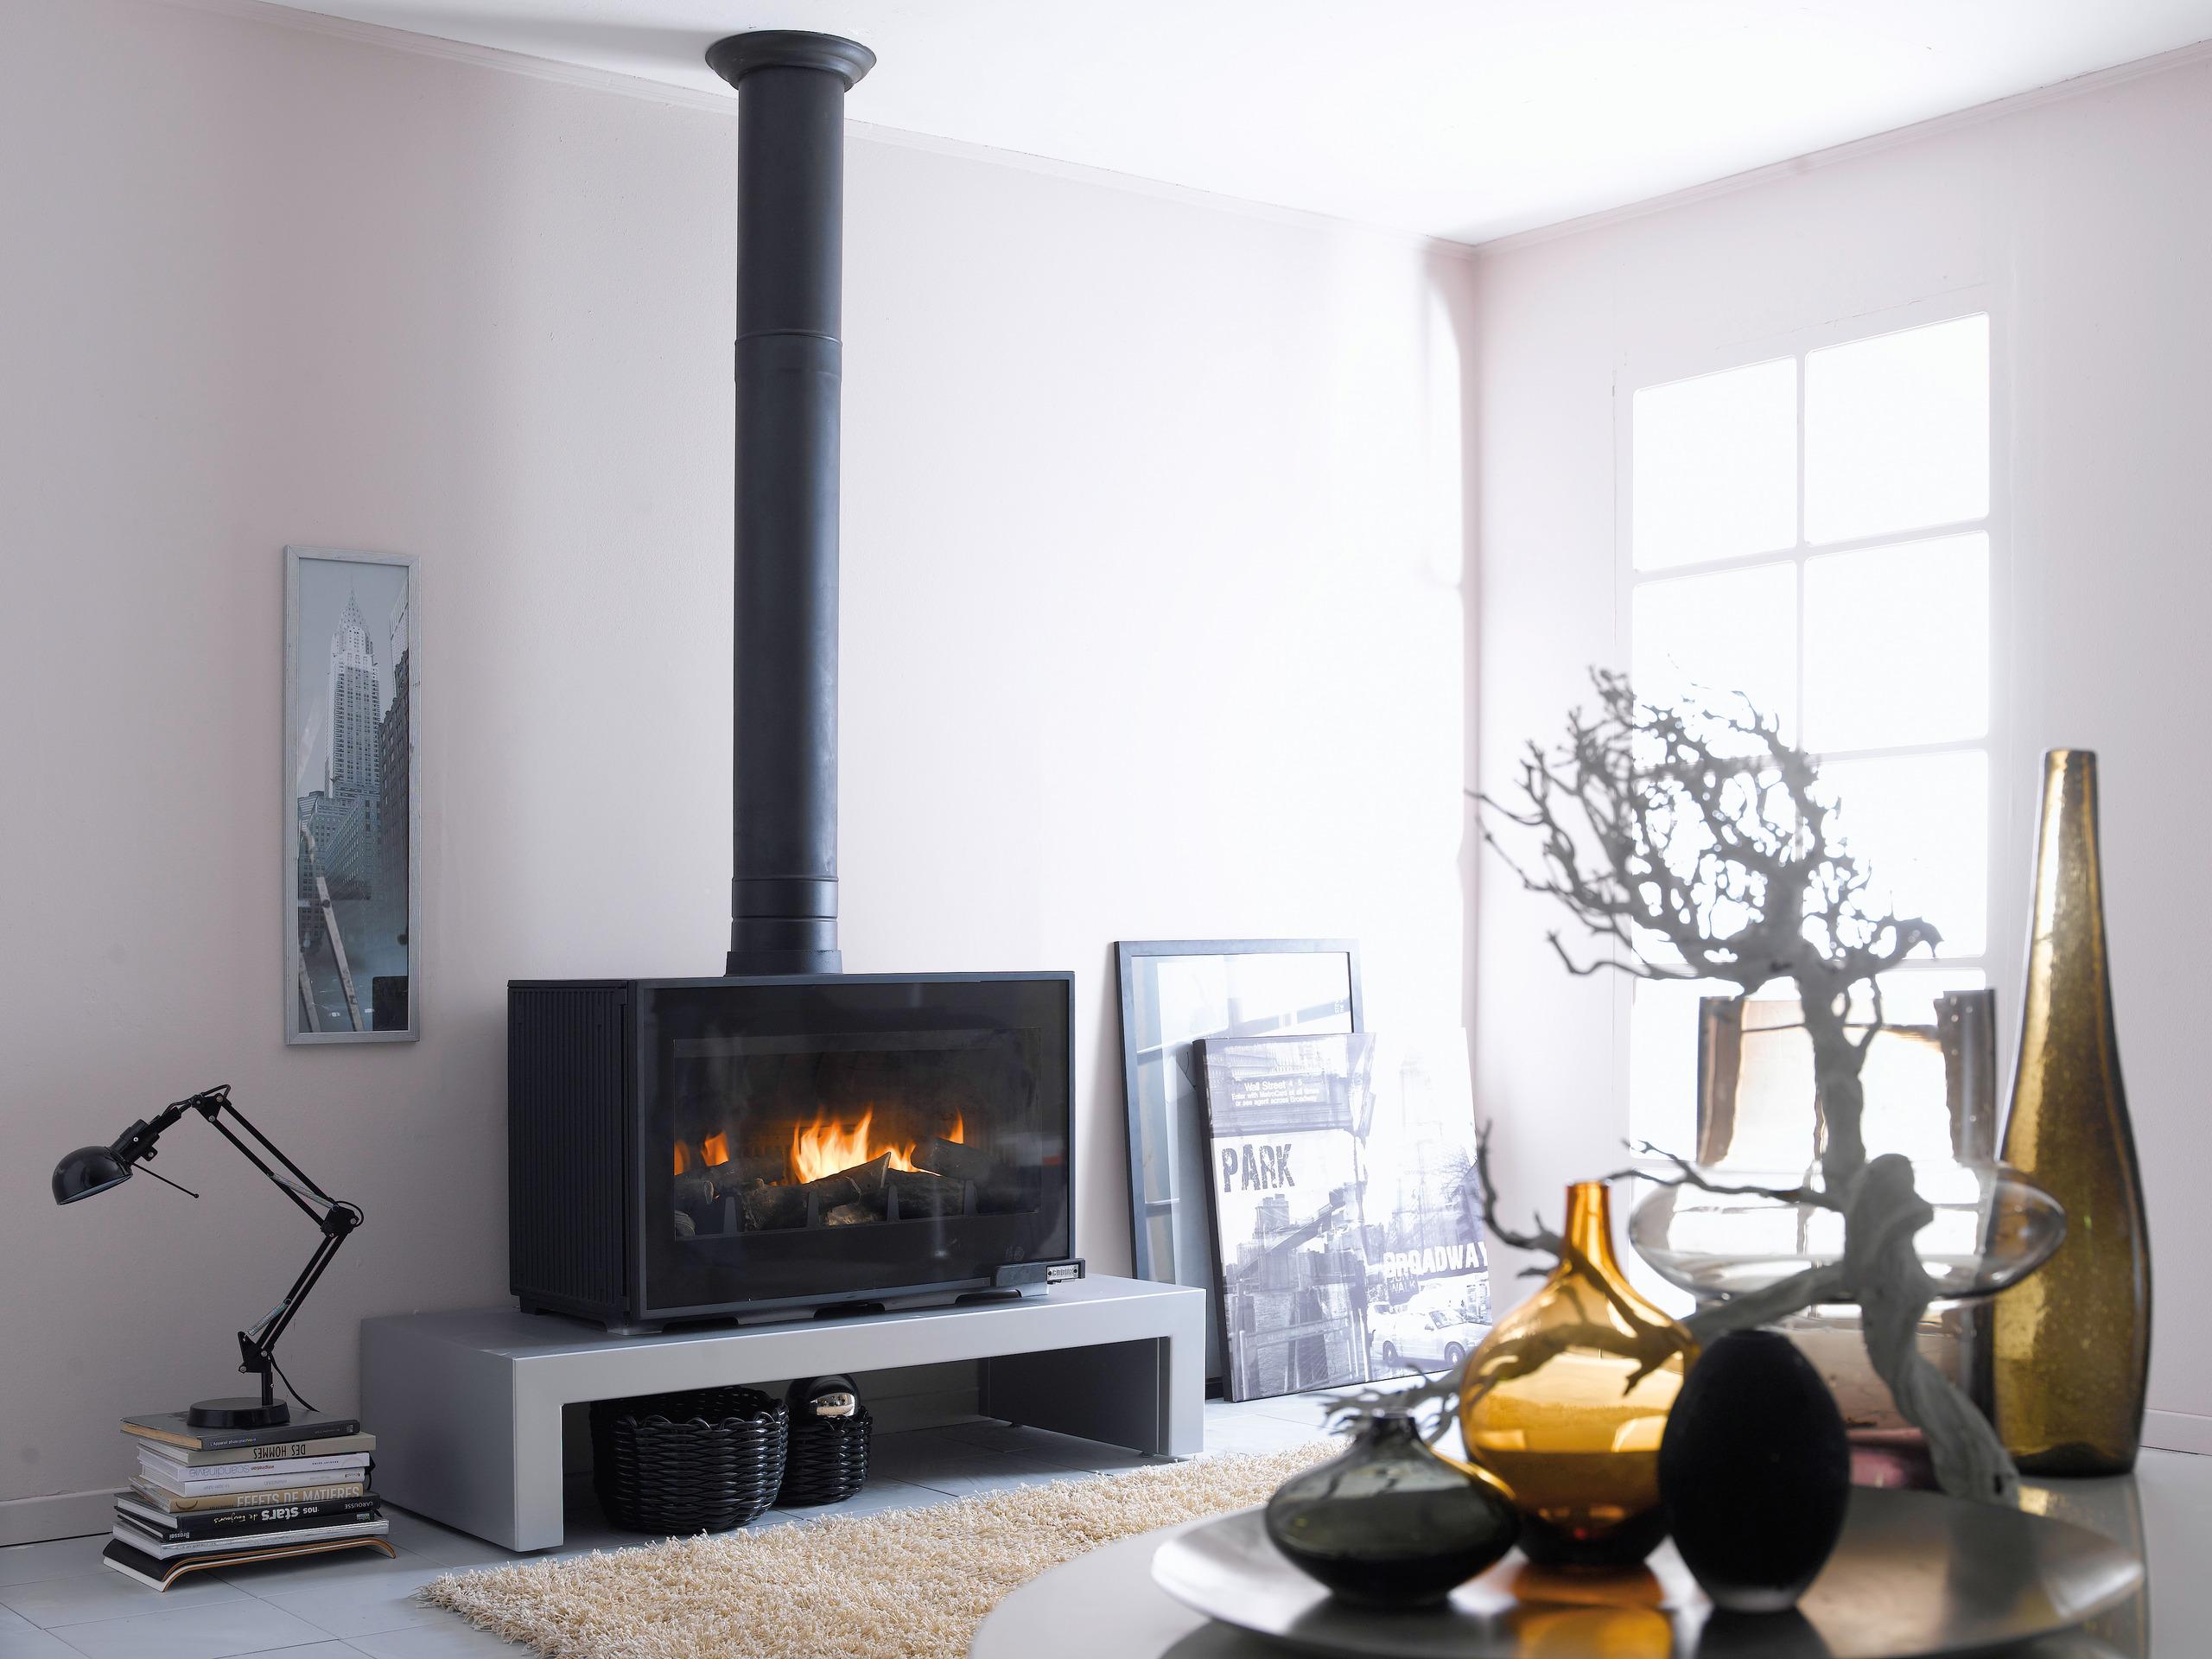 kominki godin krak w oferta piece ze szklanymi. Black Bedroom Furniture Sets. Home Design Ideas